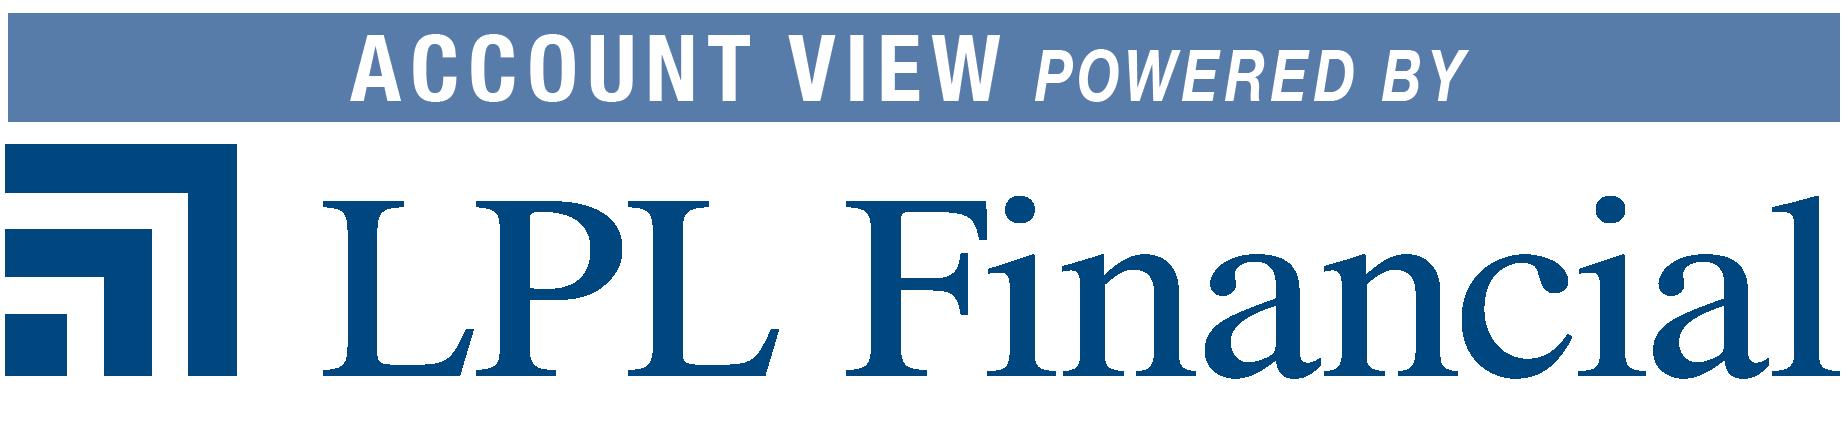 KWB Wealth | Redlands, CA: LPL Financial account view logo